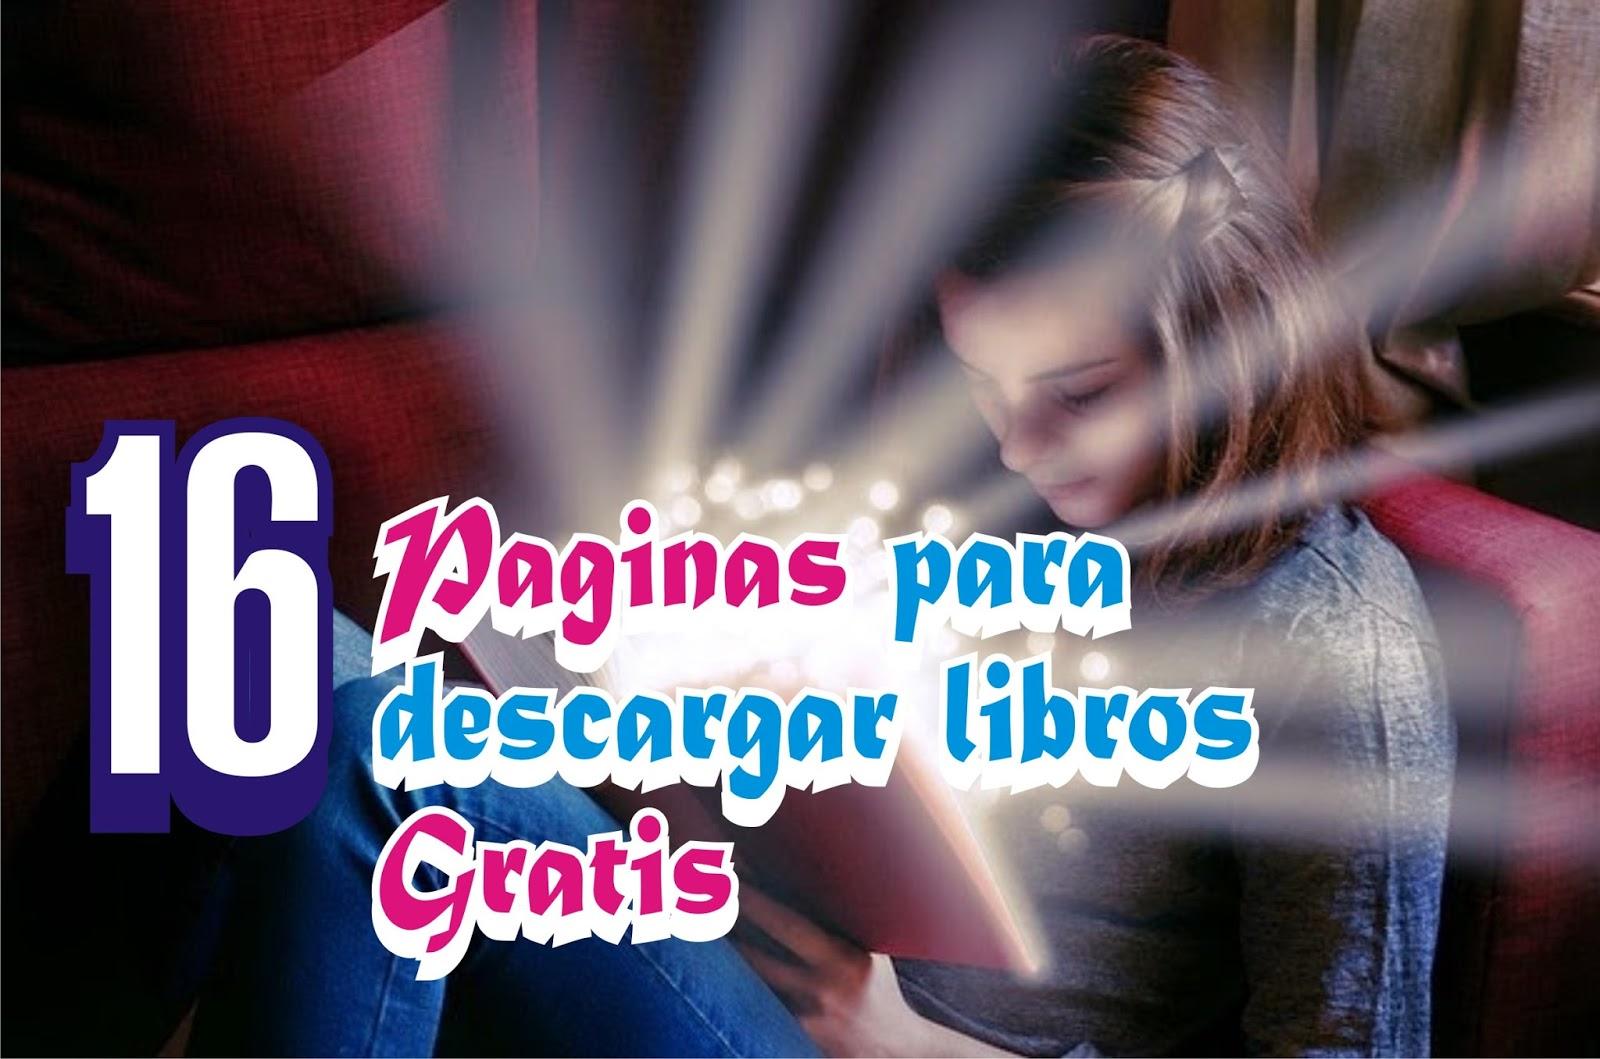 16 Sitios Para Descargar Libros Gratis EnPDF, DOC, EPUB